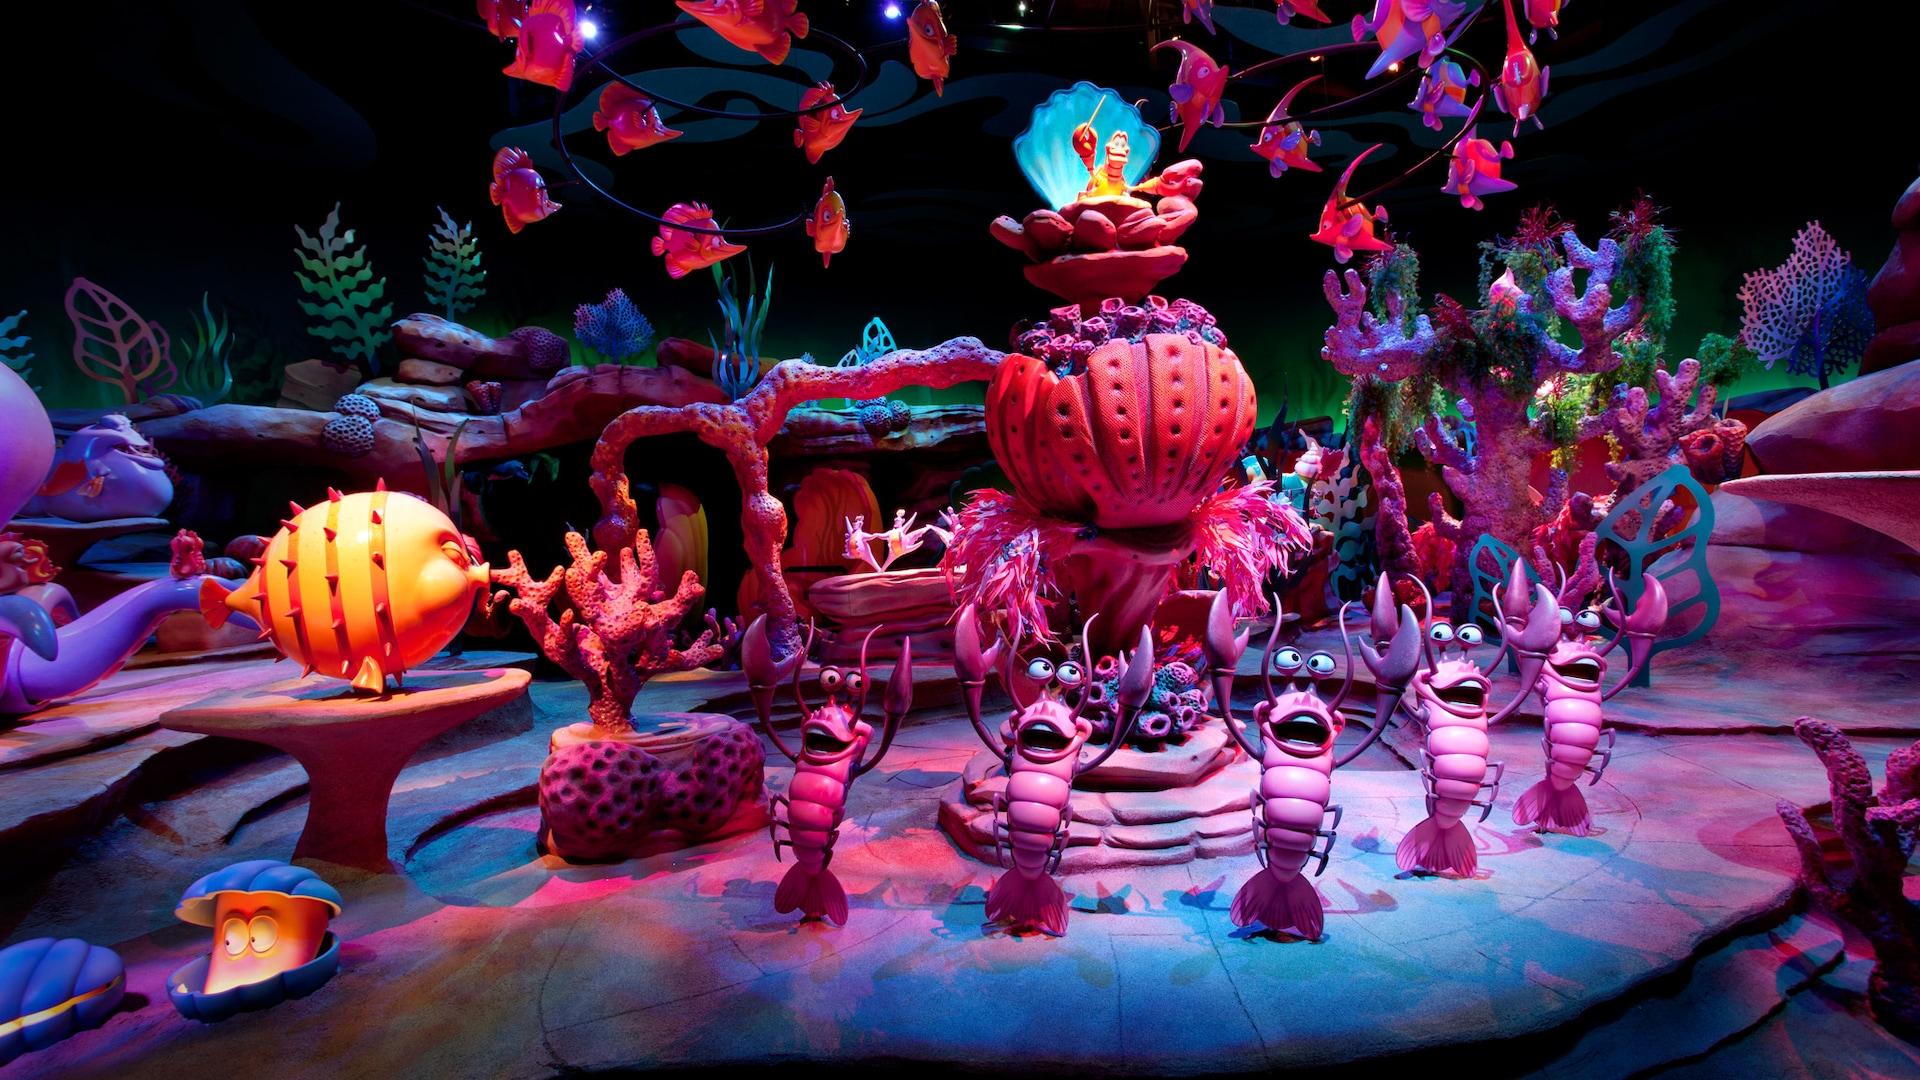 The Little Mermaid - Ariel's Undersea Adventure | California